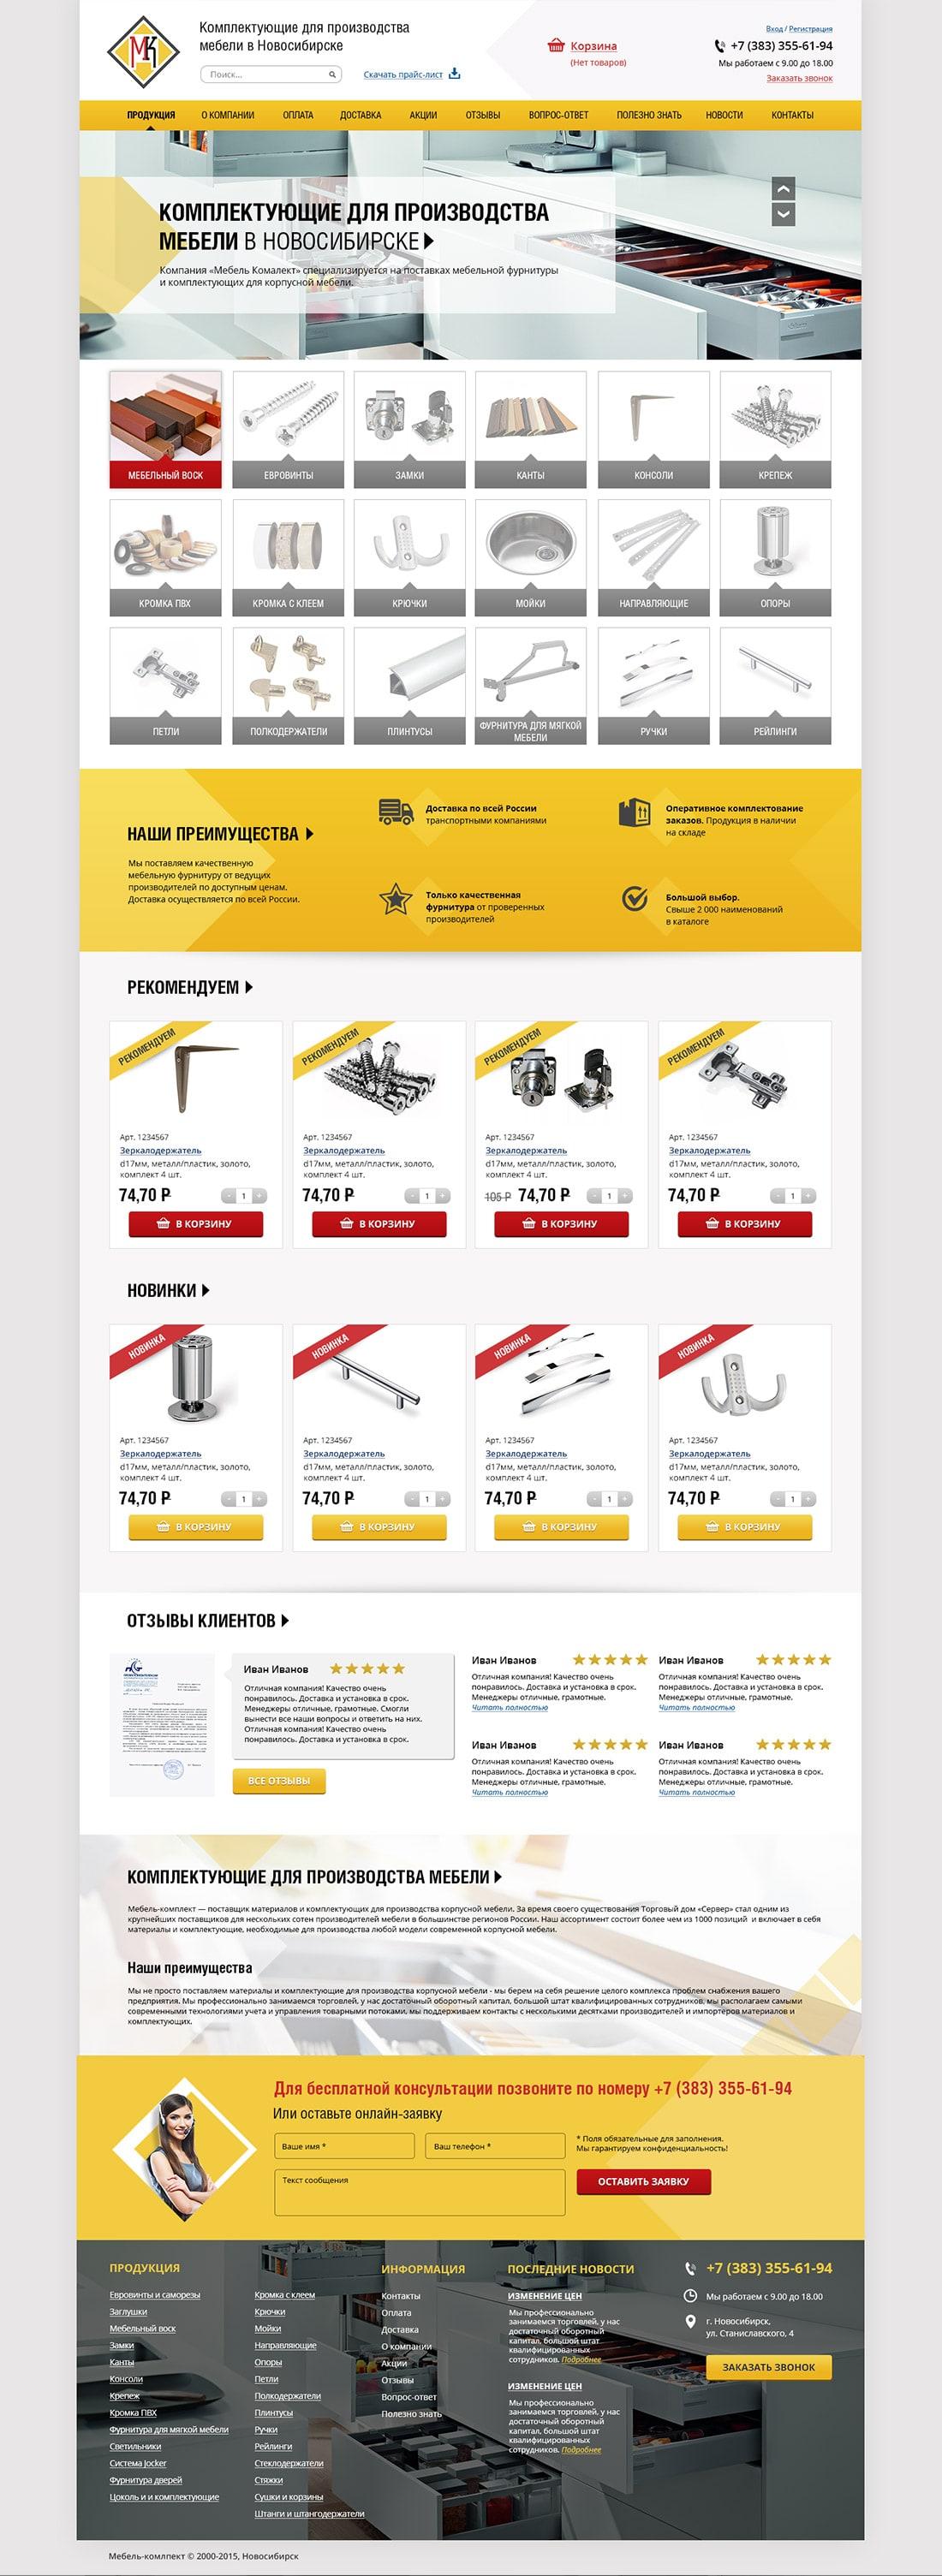 Интернет-каталог мебельной фурнитуры mebel-komplekt54.ru - п.